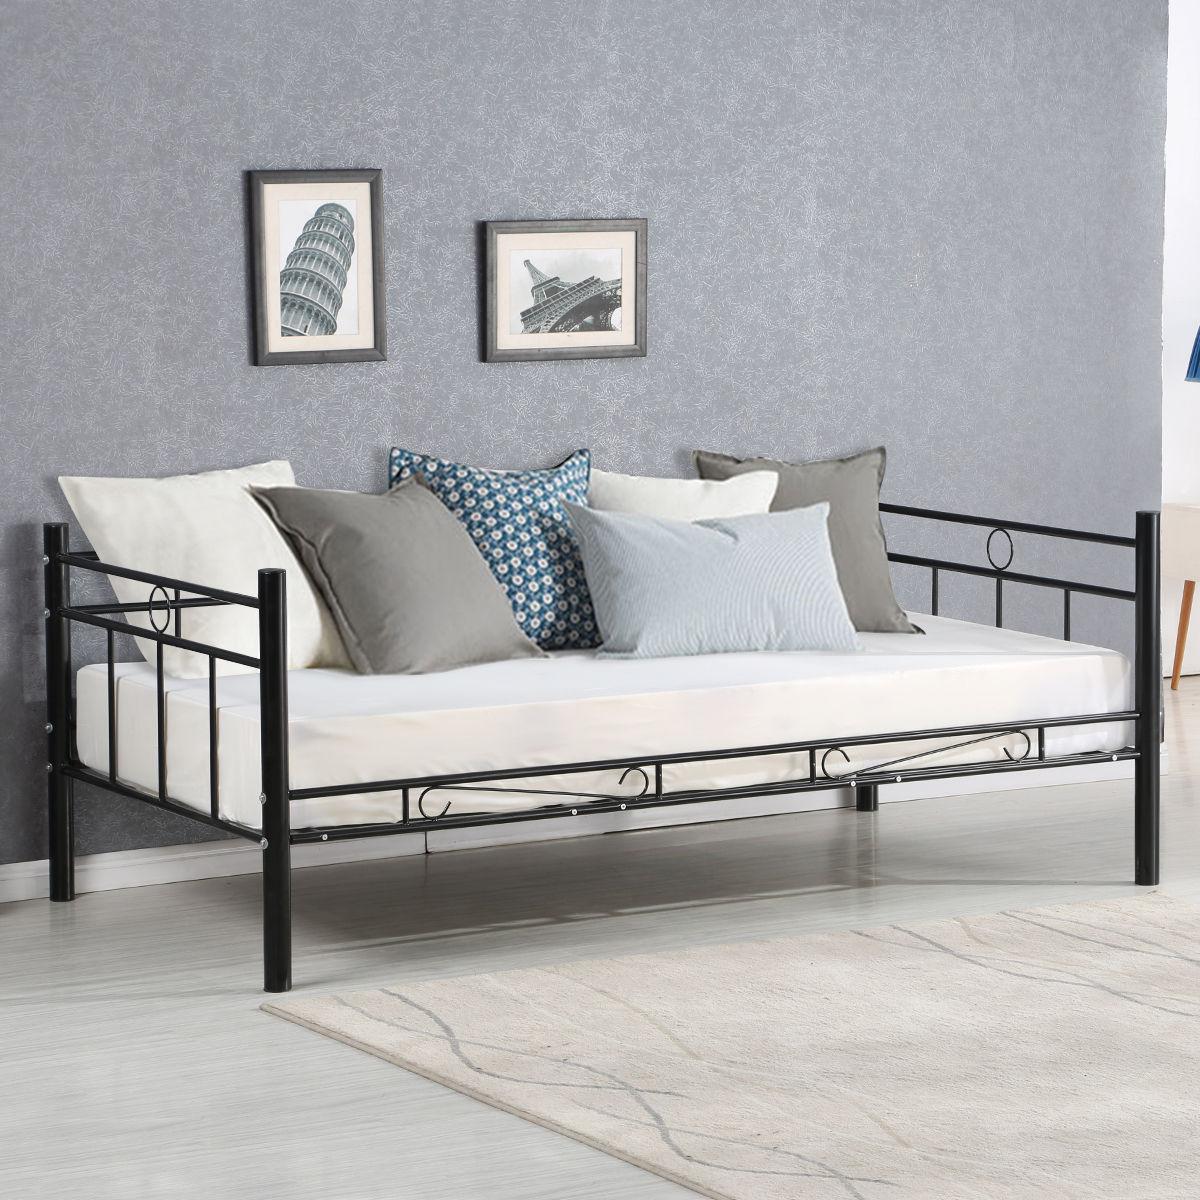 Giantex tamaño doble Daybed sofá cama dormitorio moderno del Metal ...